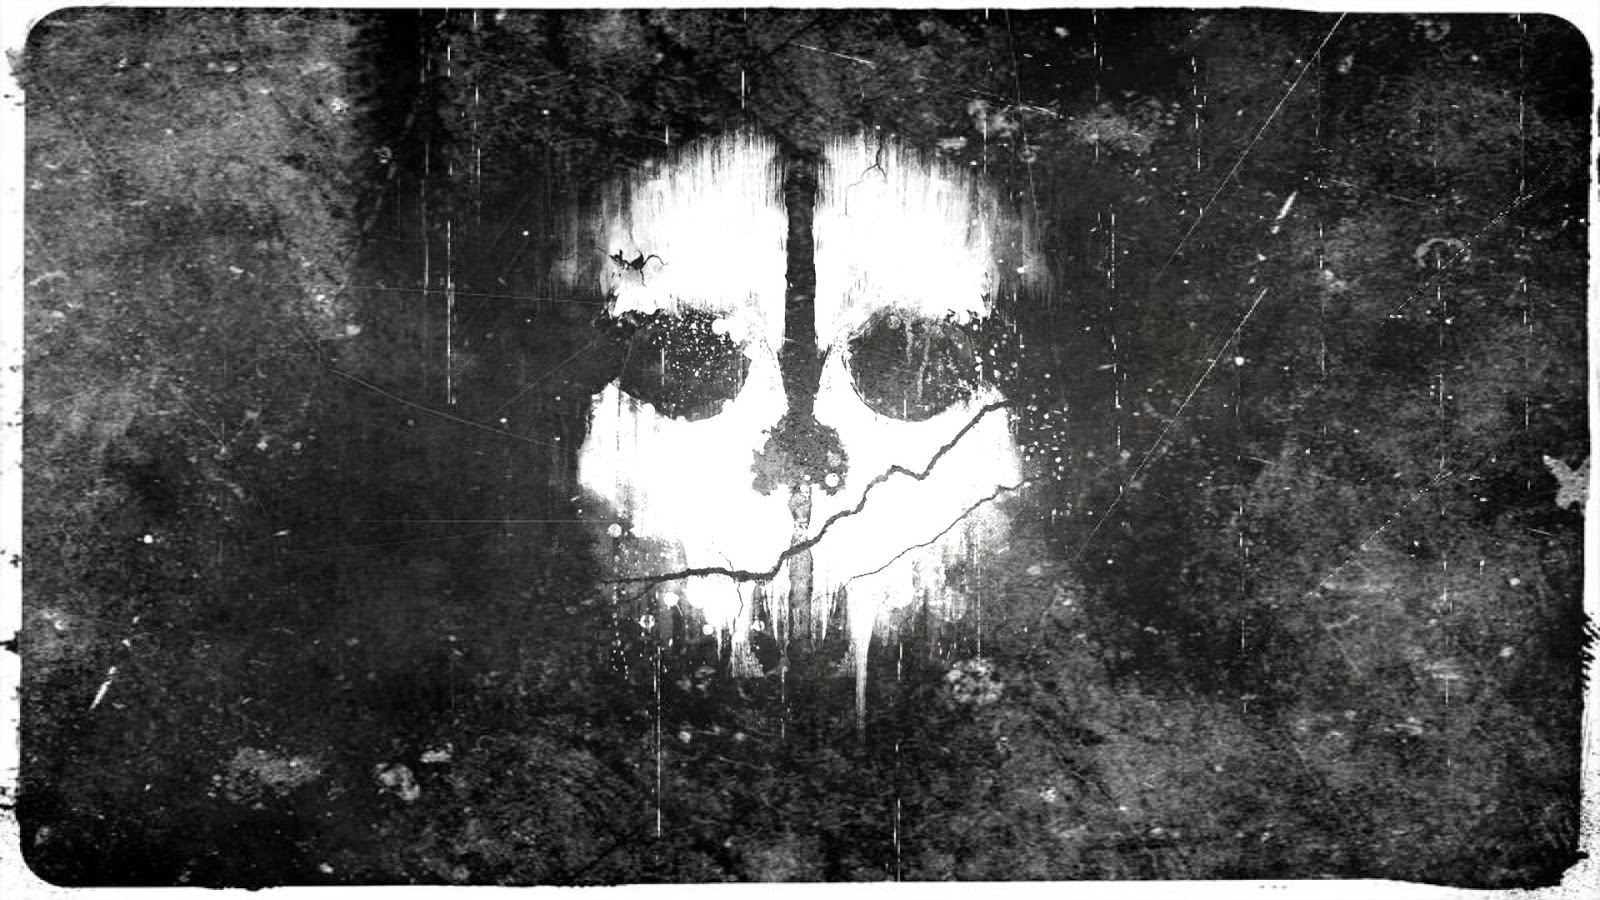 Call Of Duty Ghosts Skull Wallpaper hd wallpaper: Call of ...